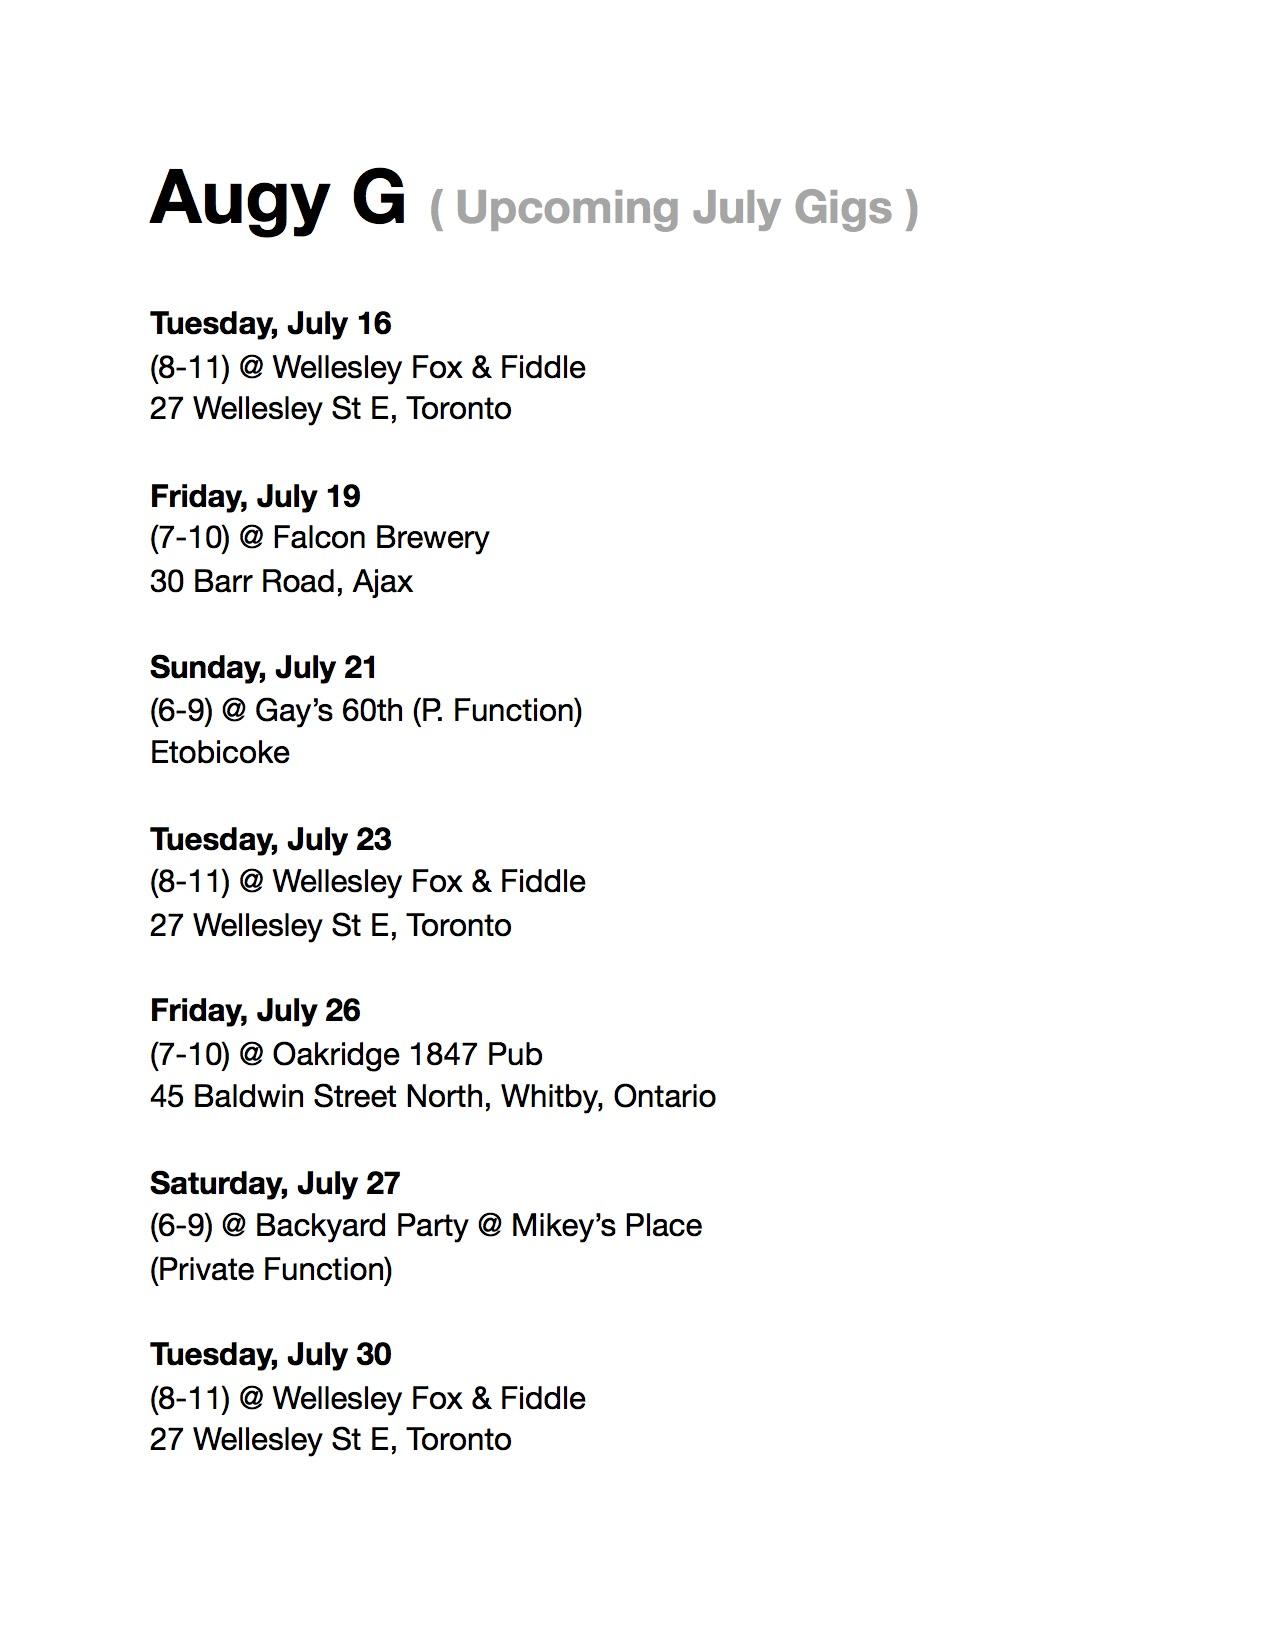 July gigs.jpg